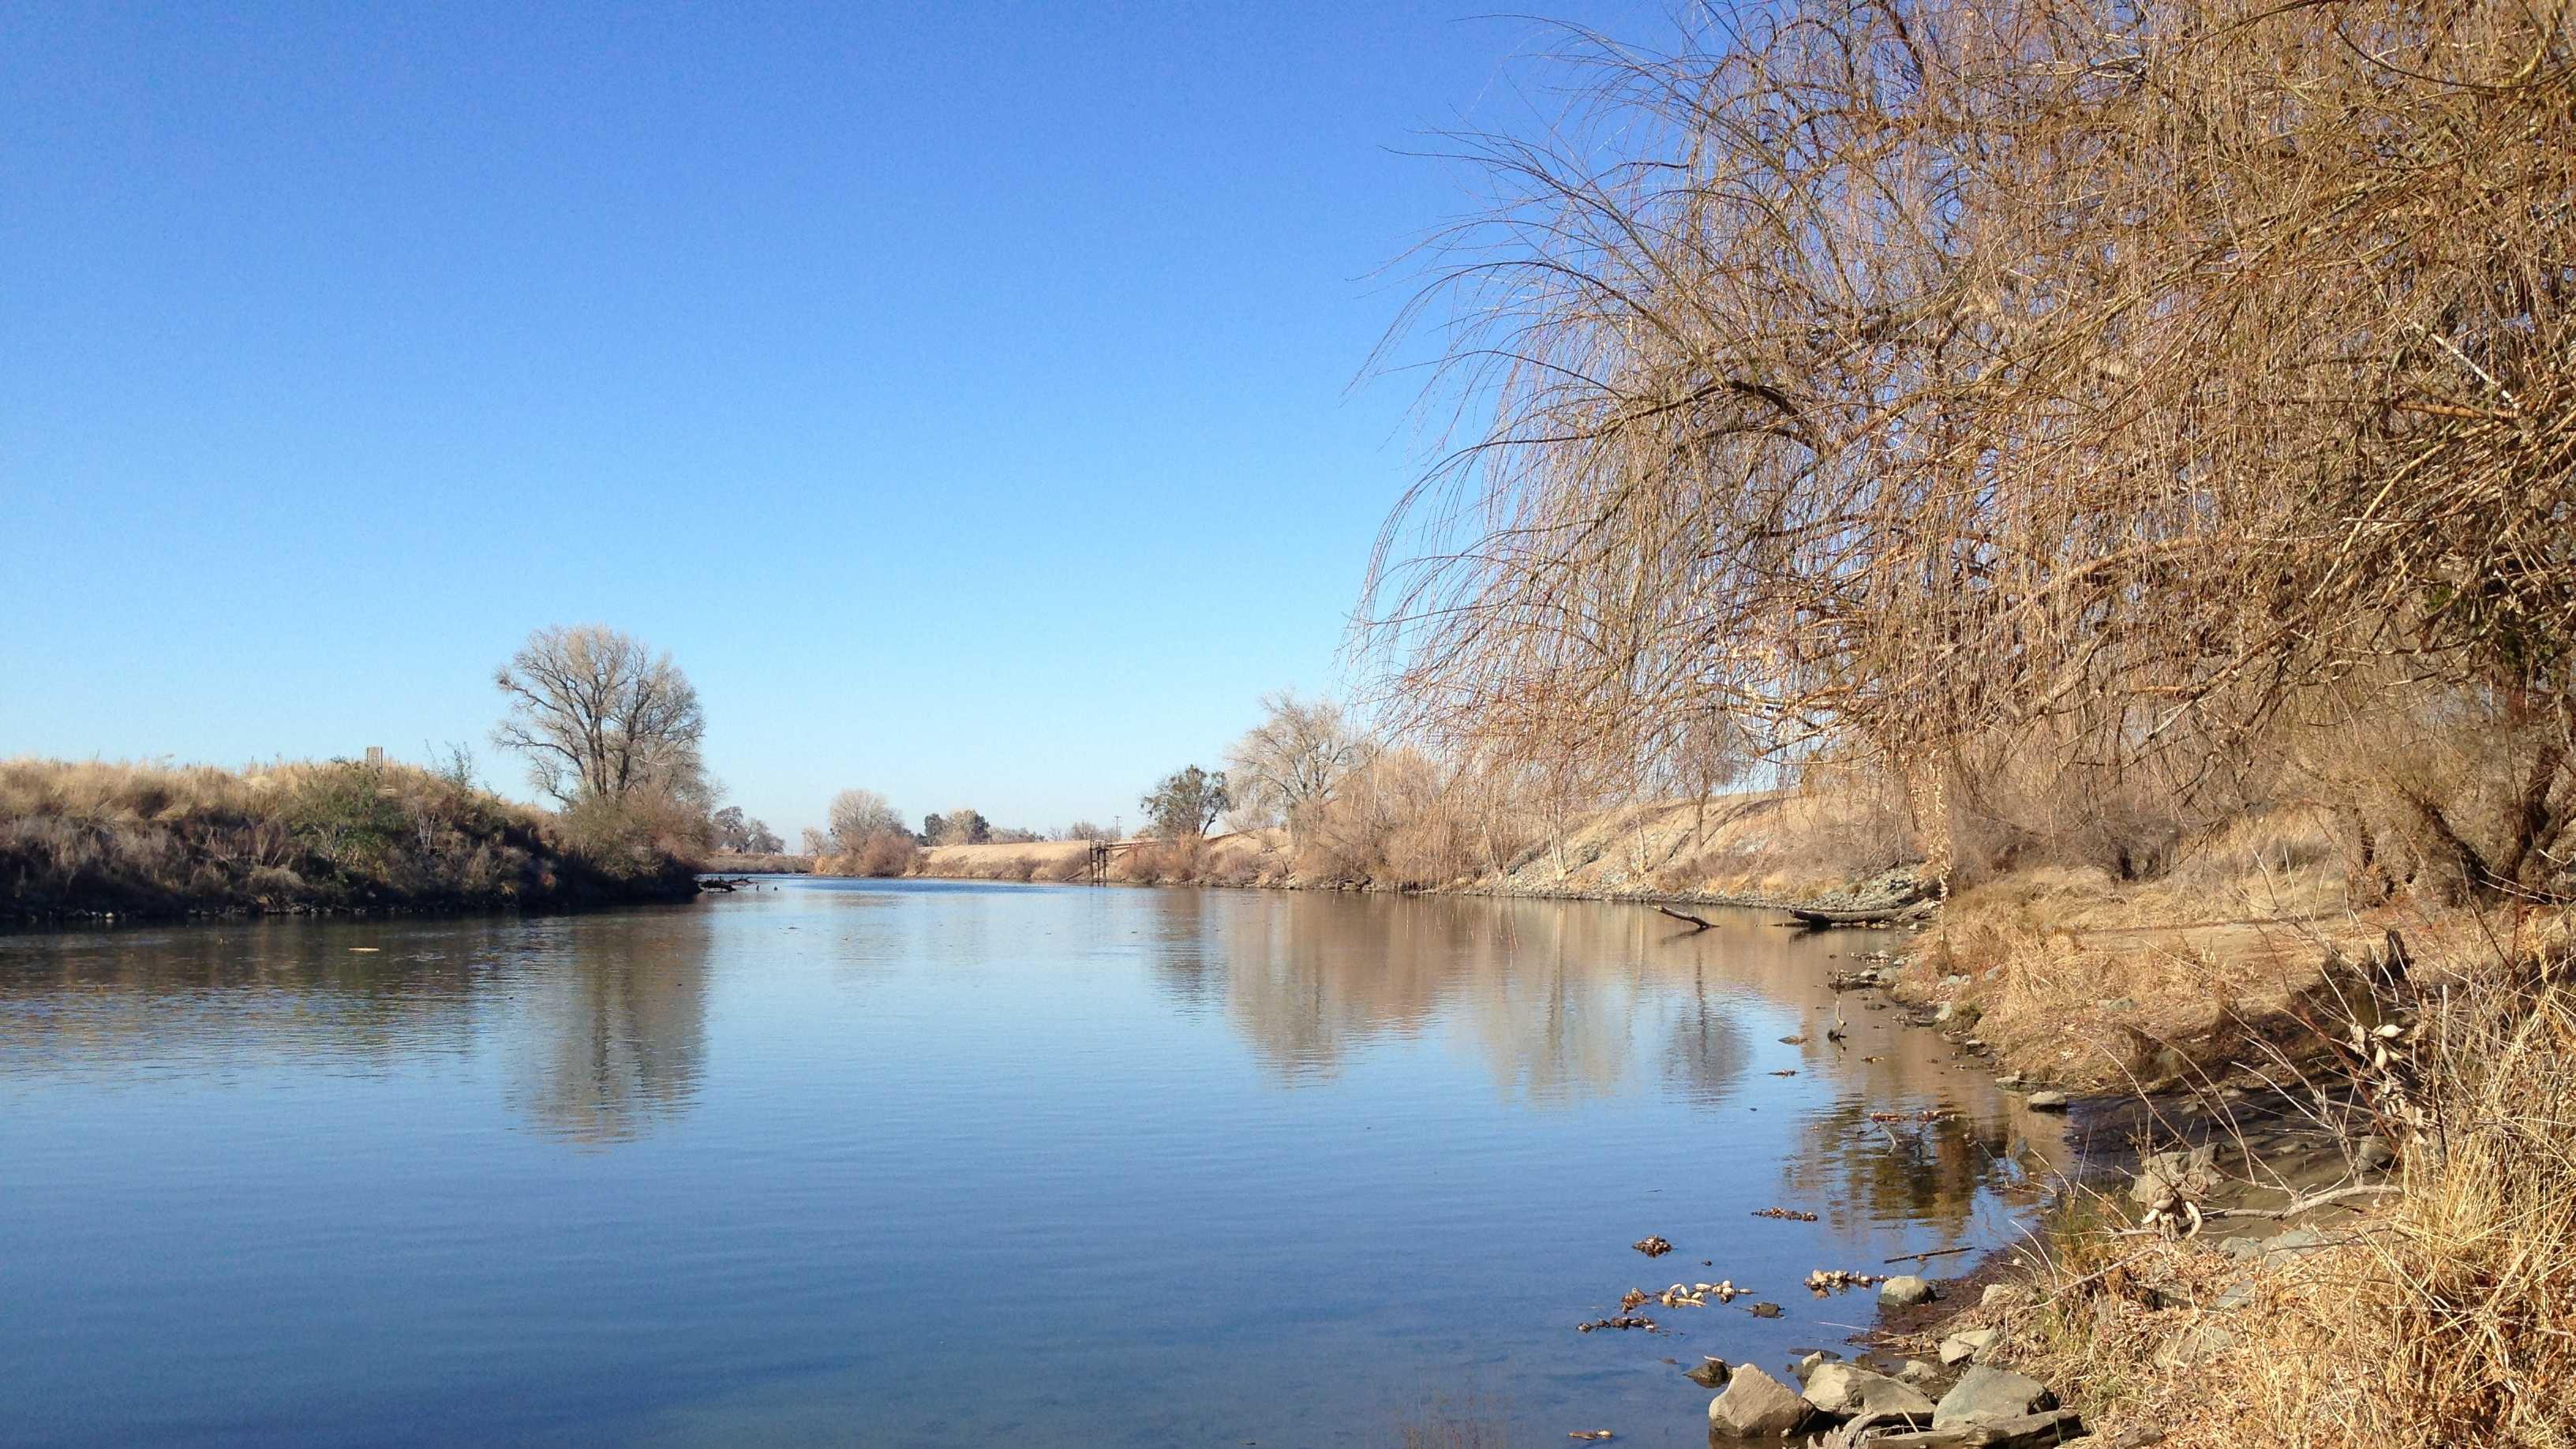 The San Joaquin River flows from the Sierra Nevada east of Fresno to the San Joaquin-Sacramento Delta.